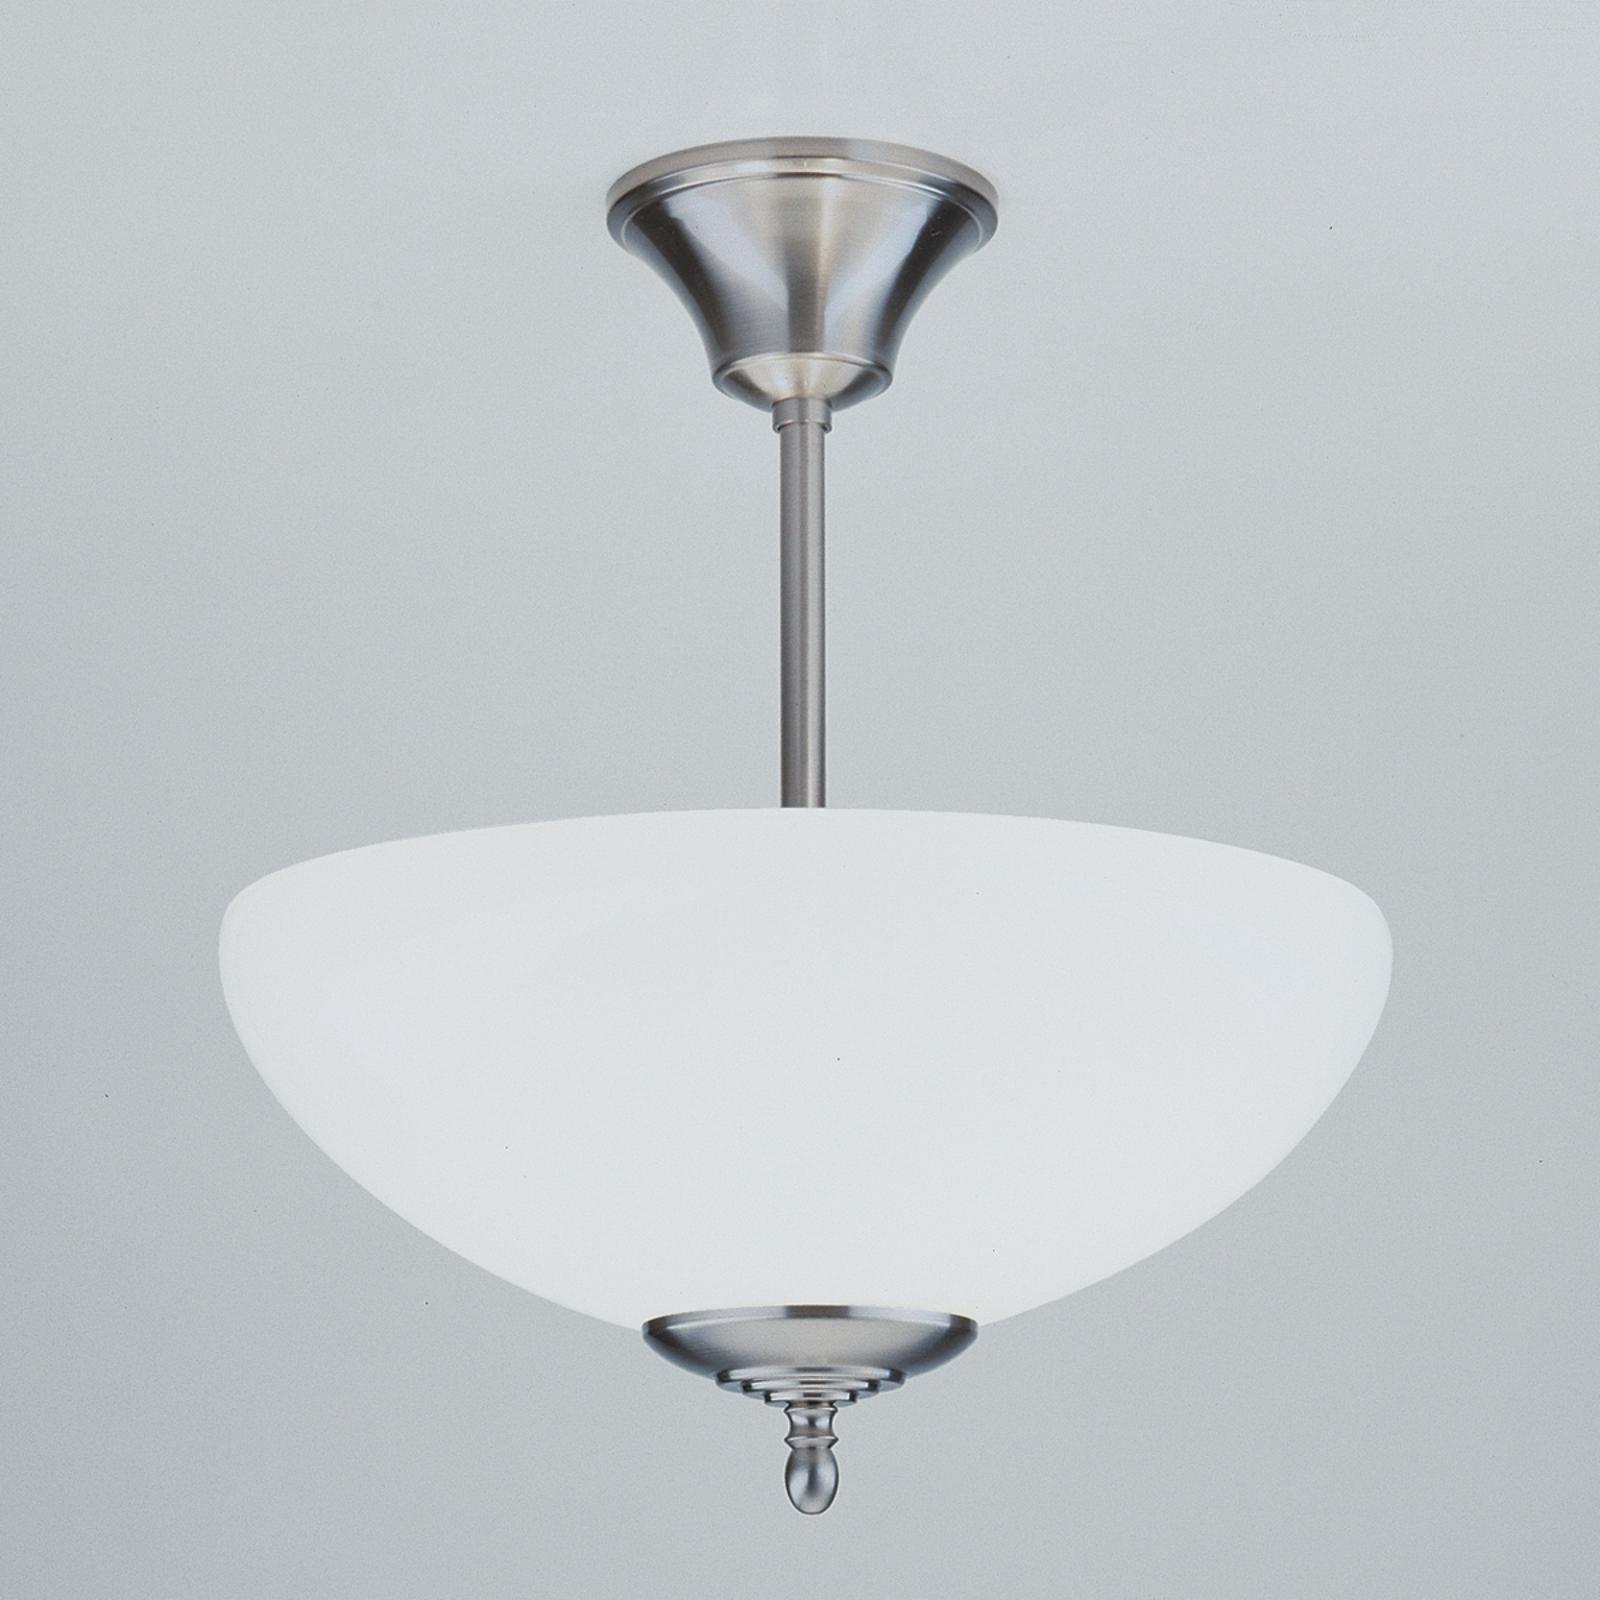 ANNI handmade ceiling light, nickel_1542023_1